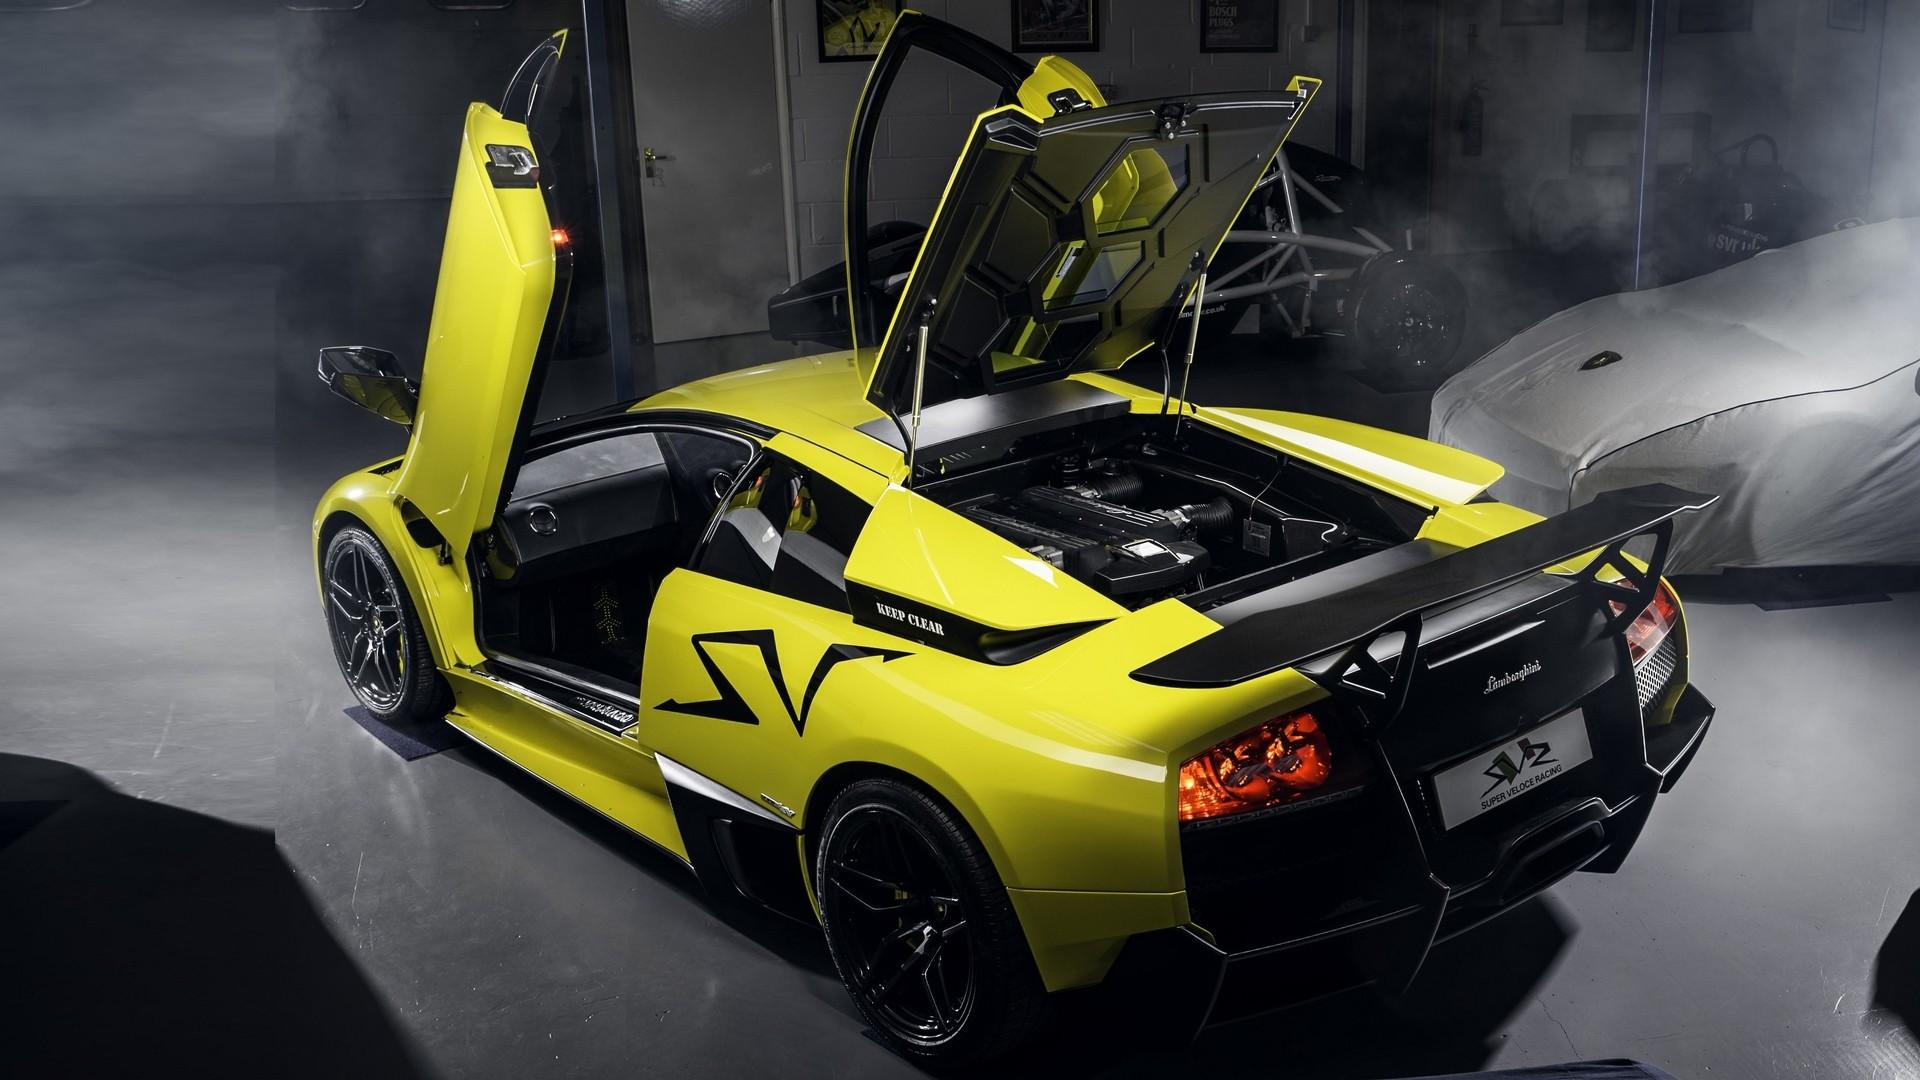 2009 Lamborghini Murcielago SV Coupe